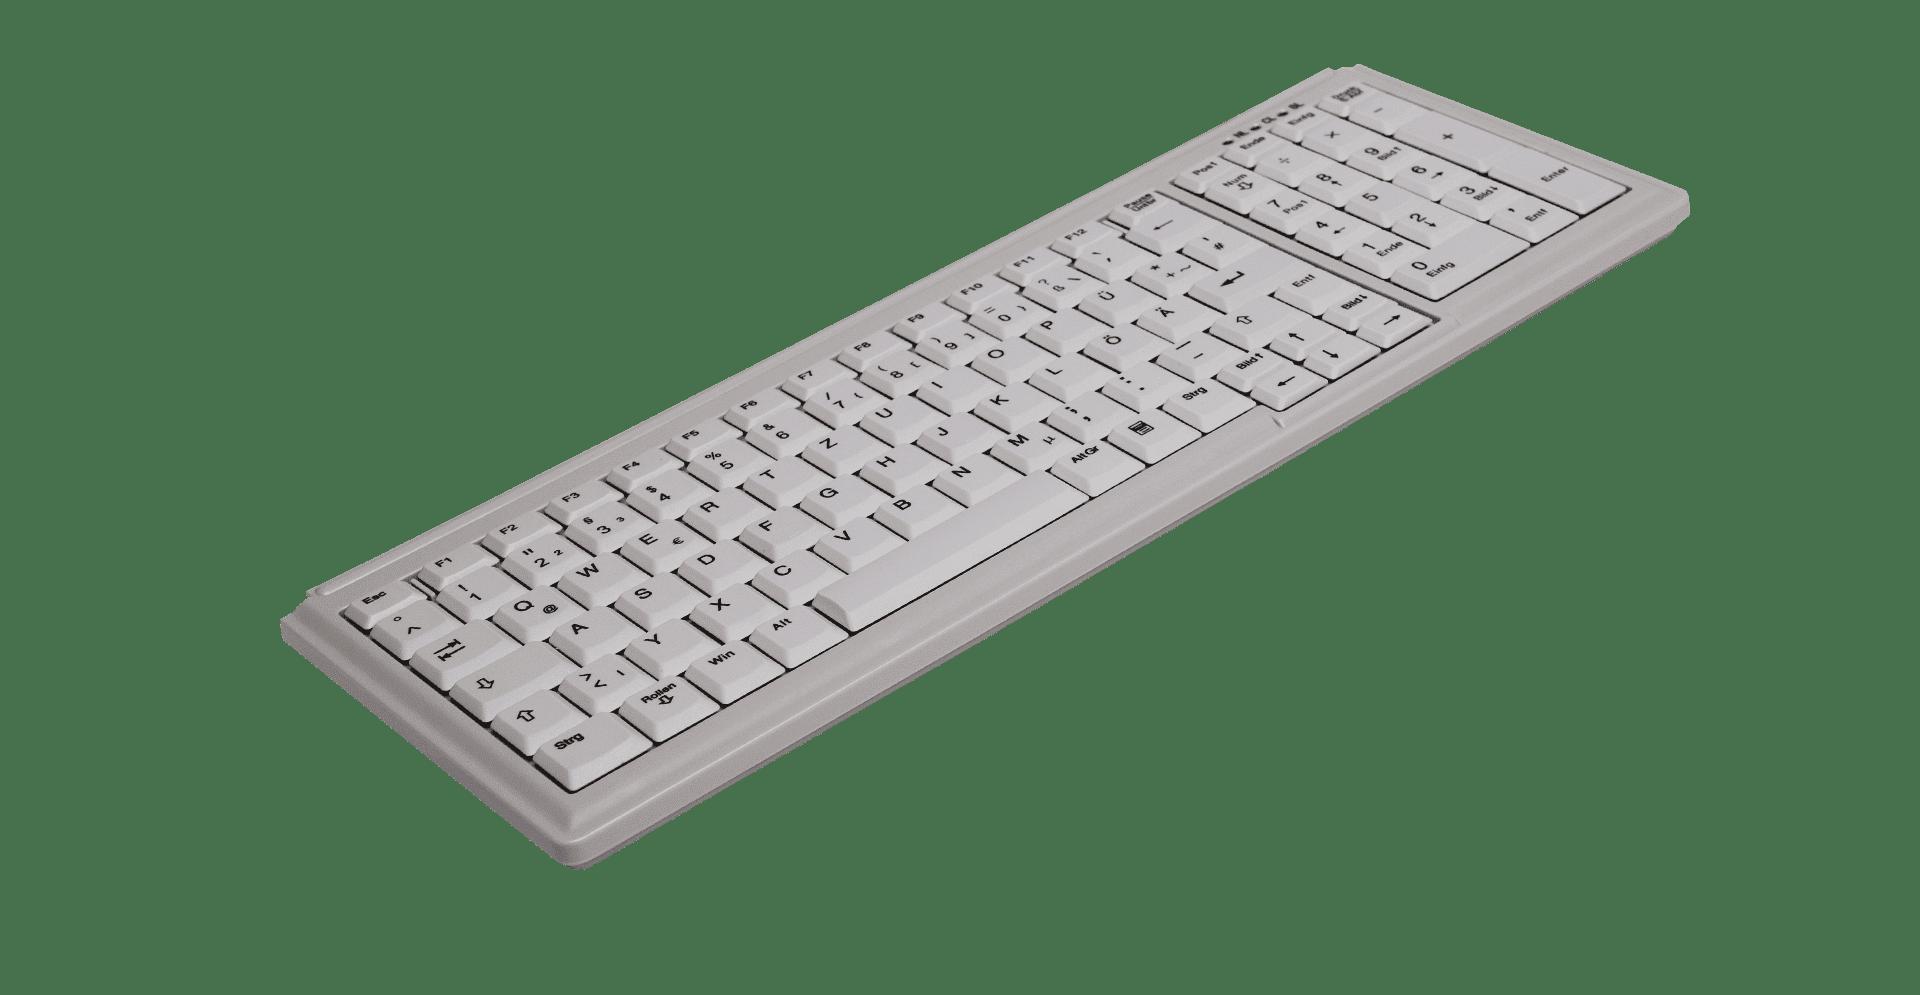 AK-7000 Small footprint notebook style keyboard - Active Key